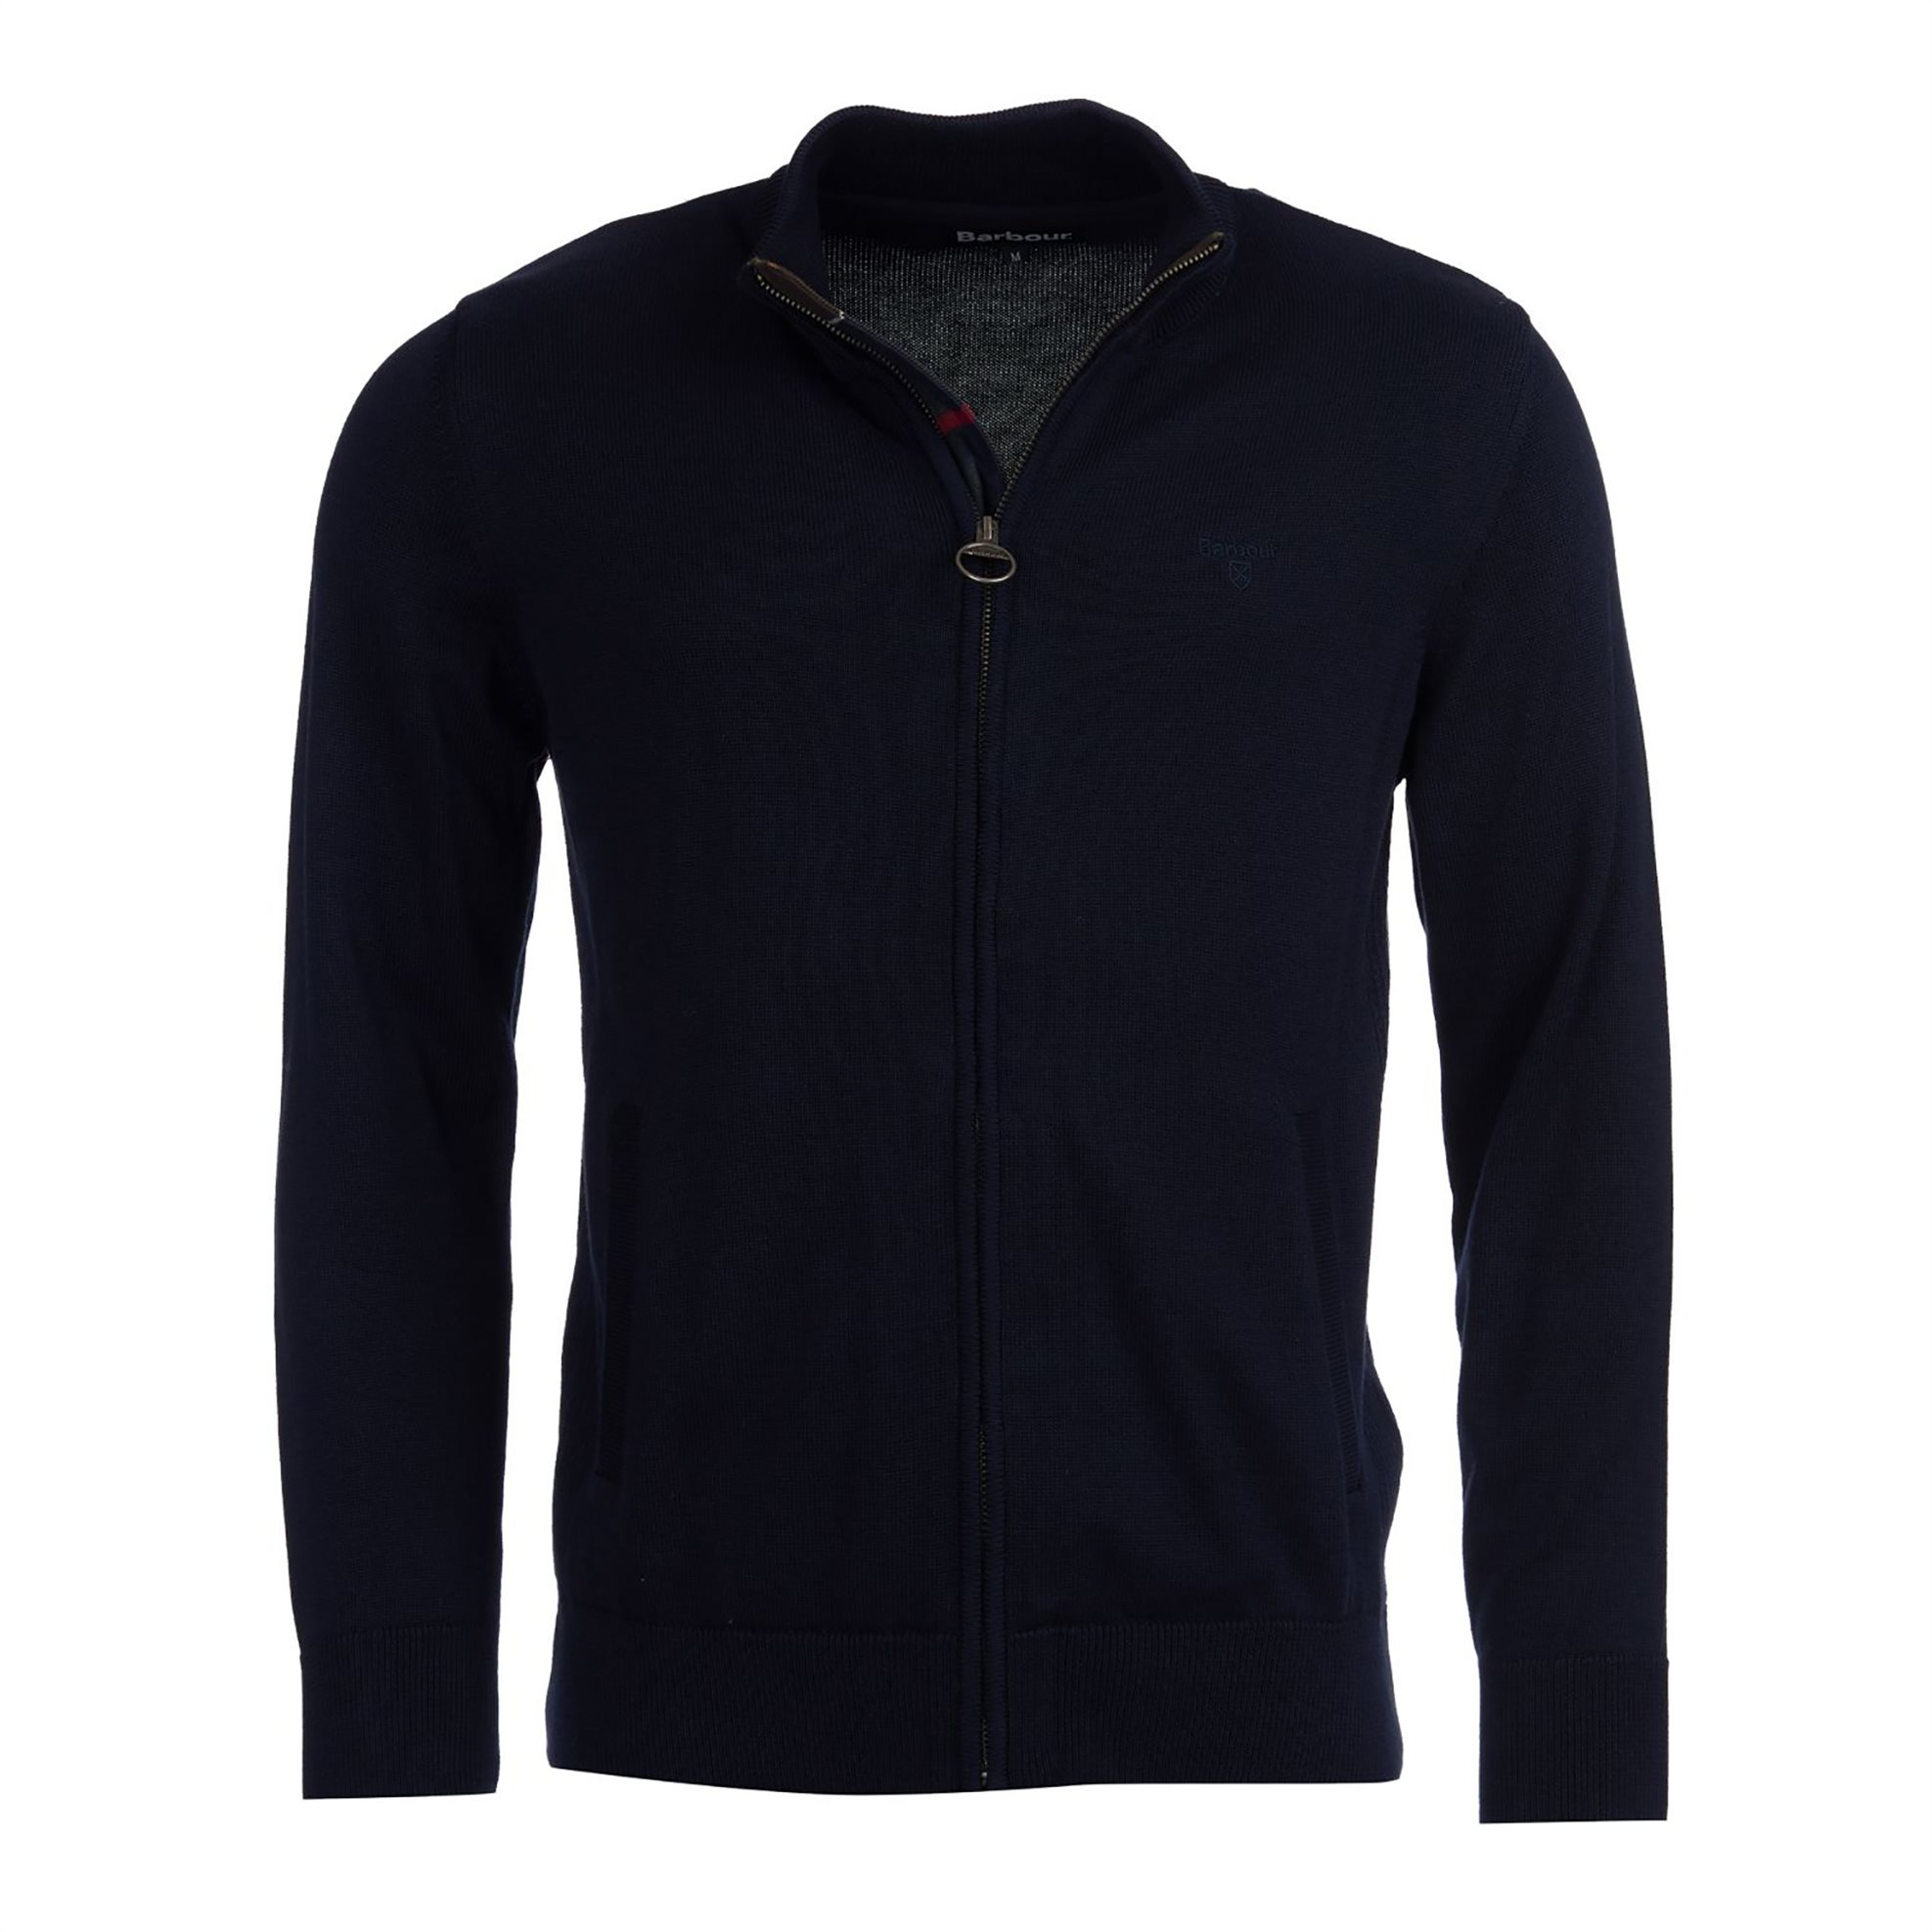 Barbour ανδρική ζακέτα με καρό λεπτομέρεια - MKN1148 - Μπλε Σκούρο ανδρασ   ρουχα   πλεκτά   ζακέτες